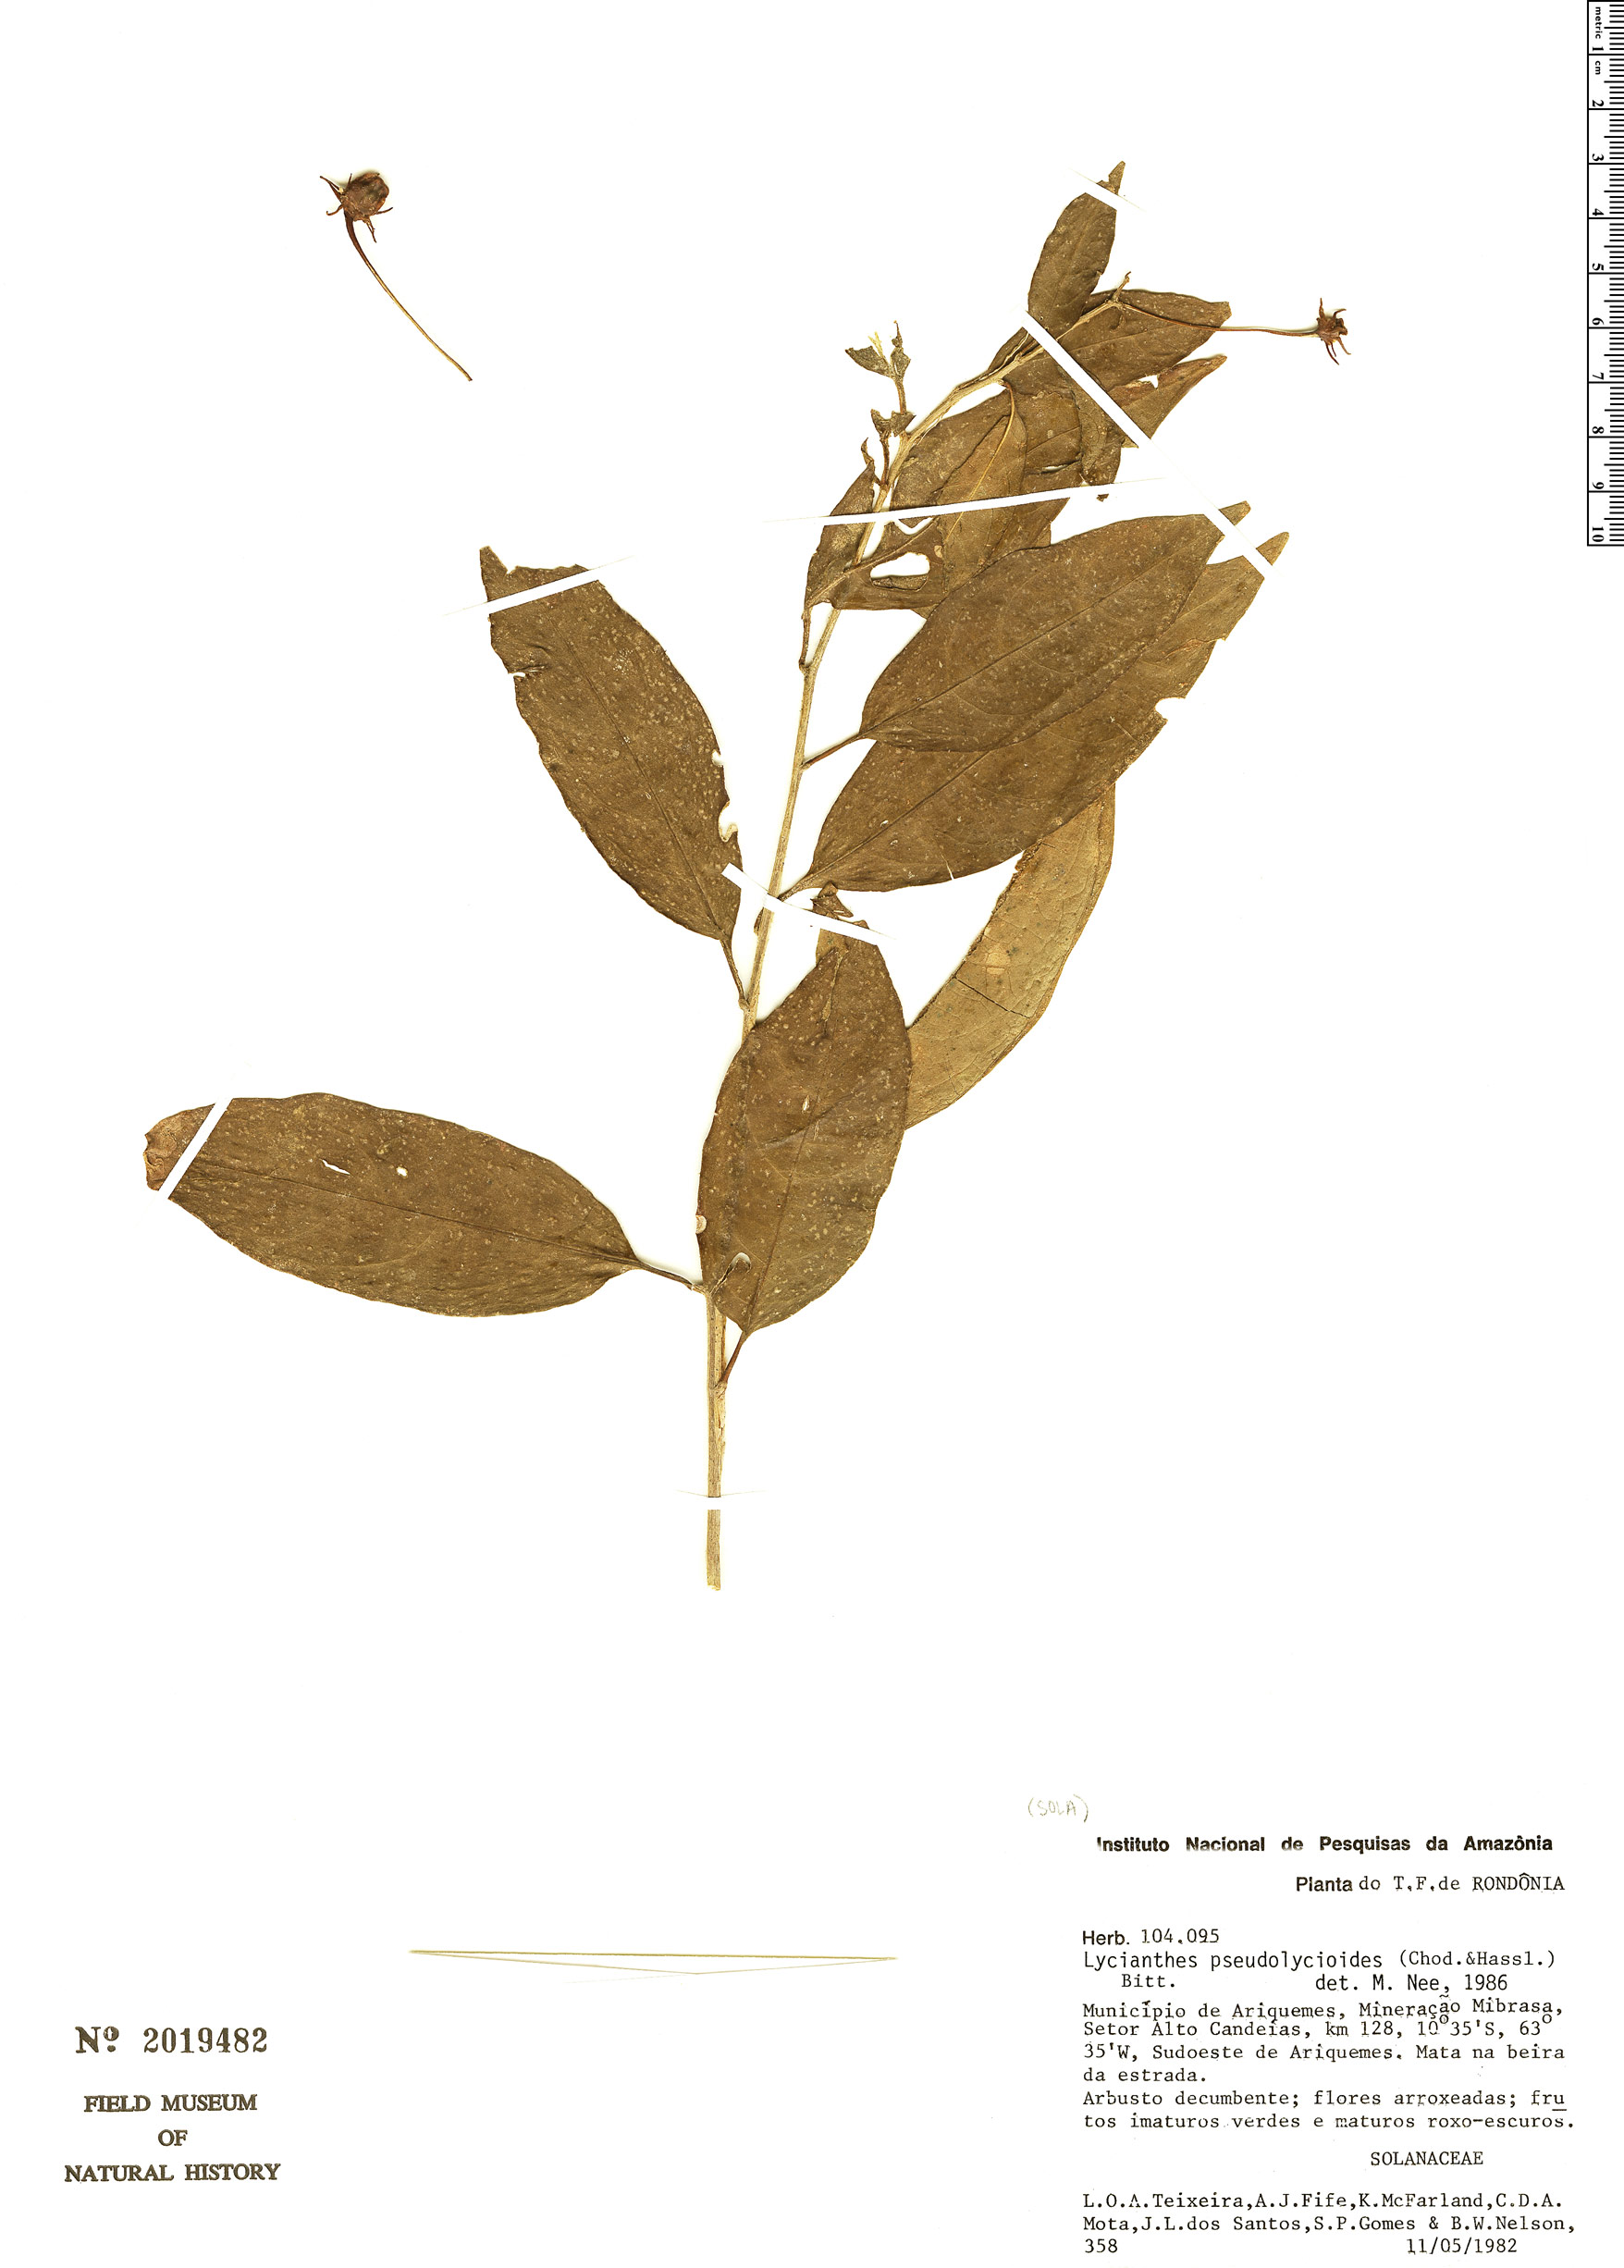 Specimen: Lycianthes pseudolycioides